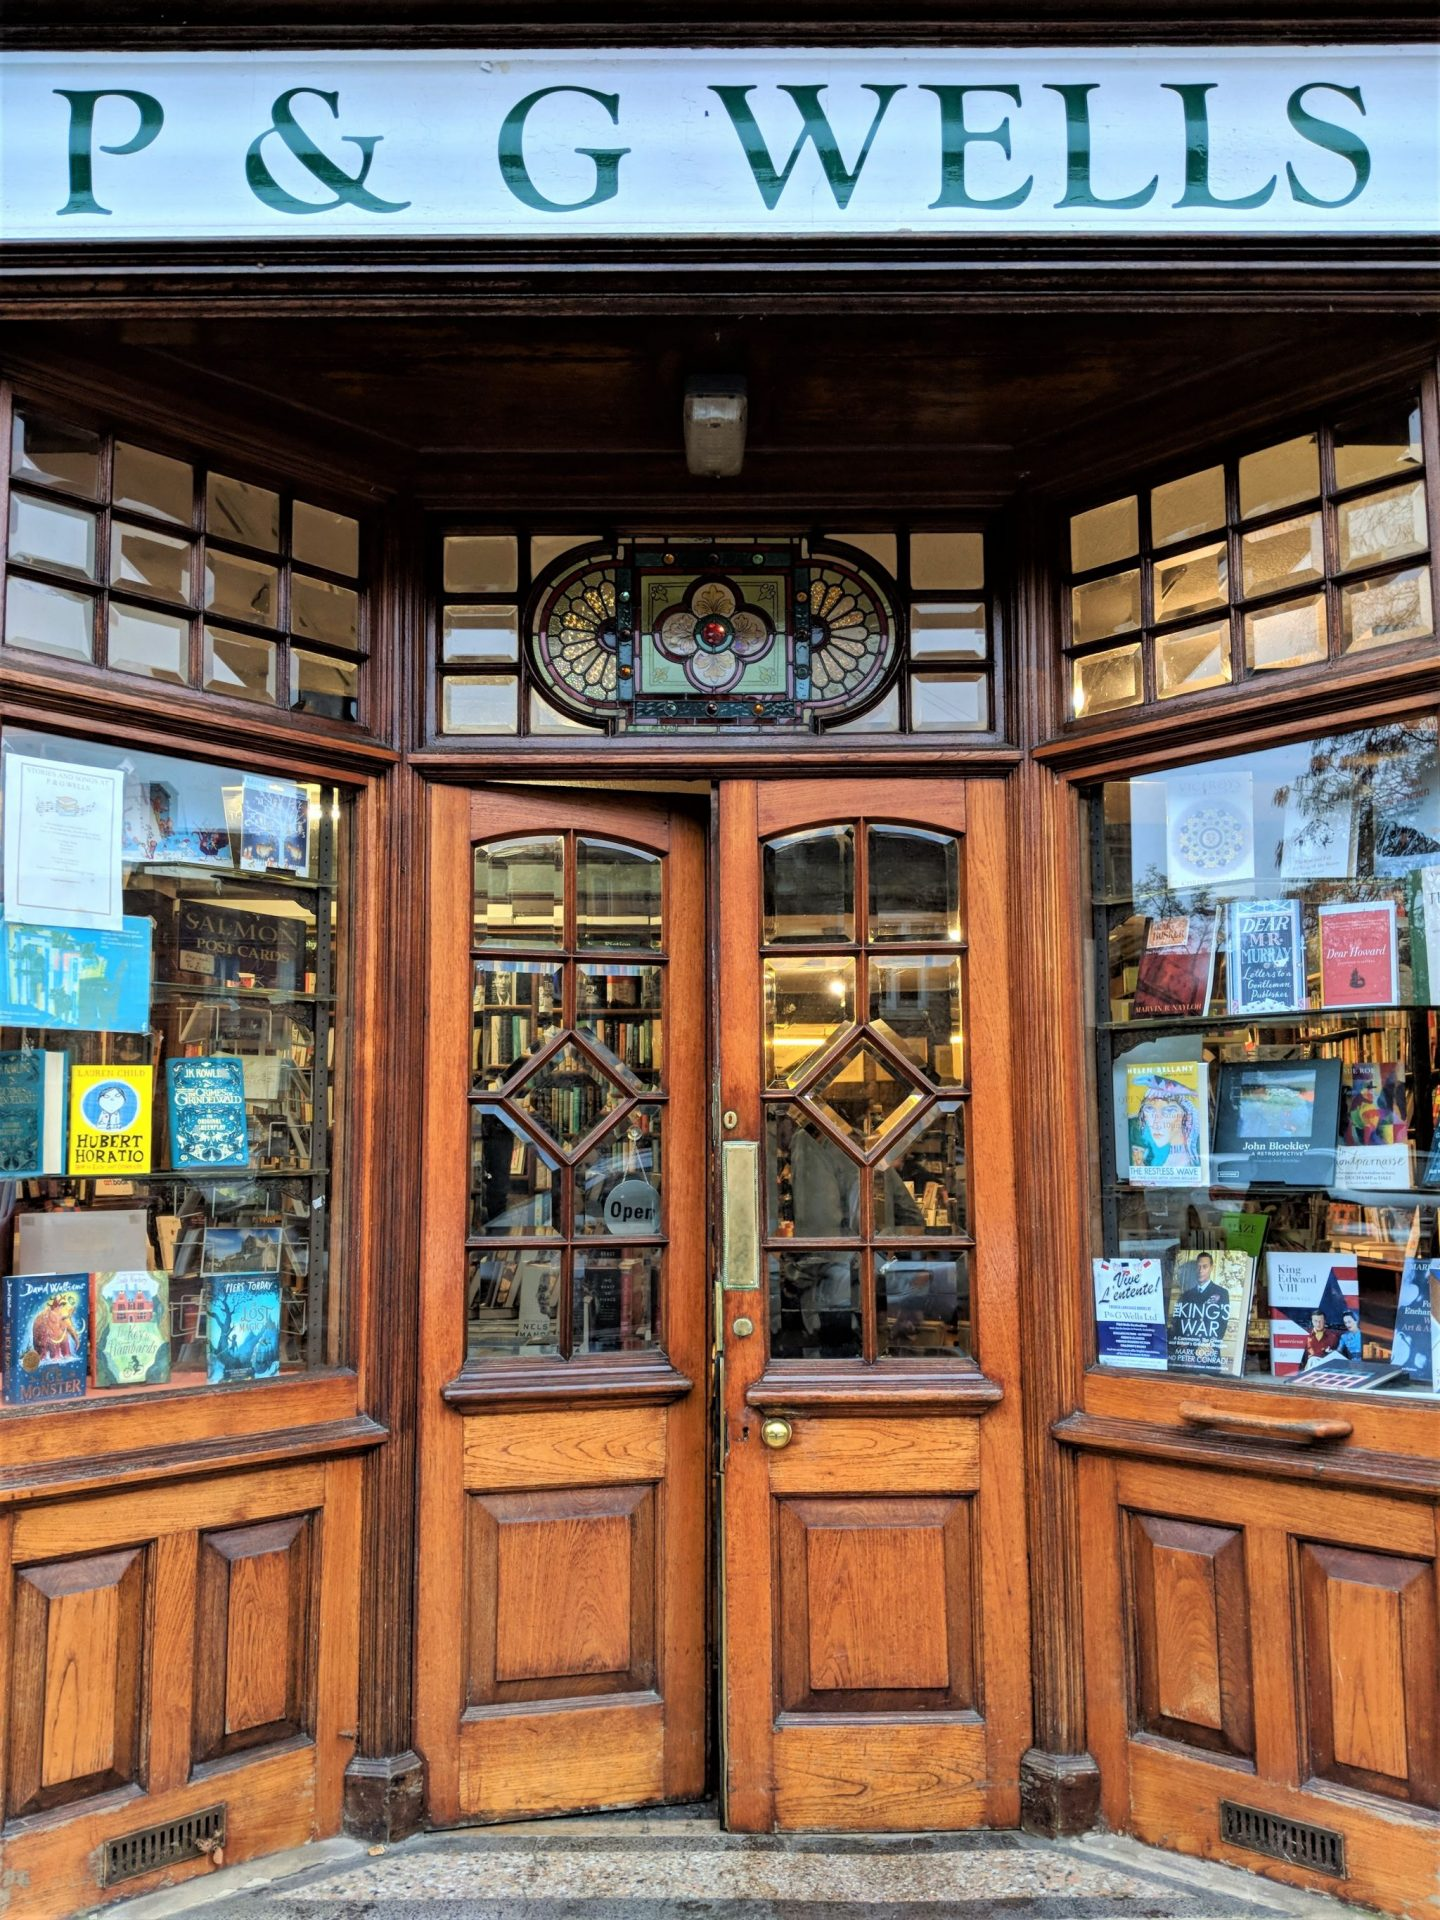 P&G Wells Bookshop Window